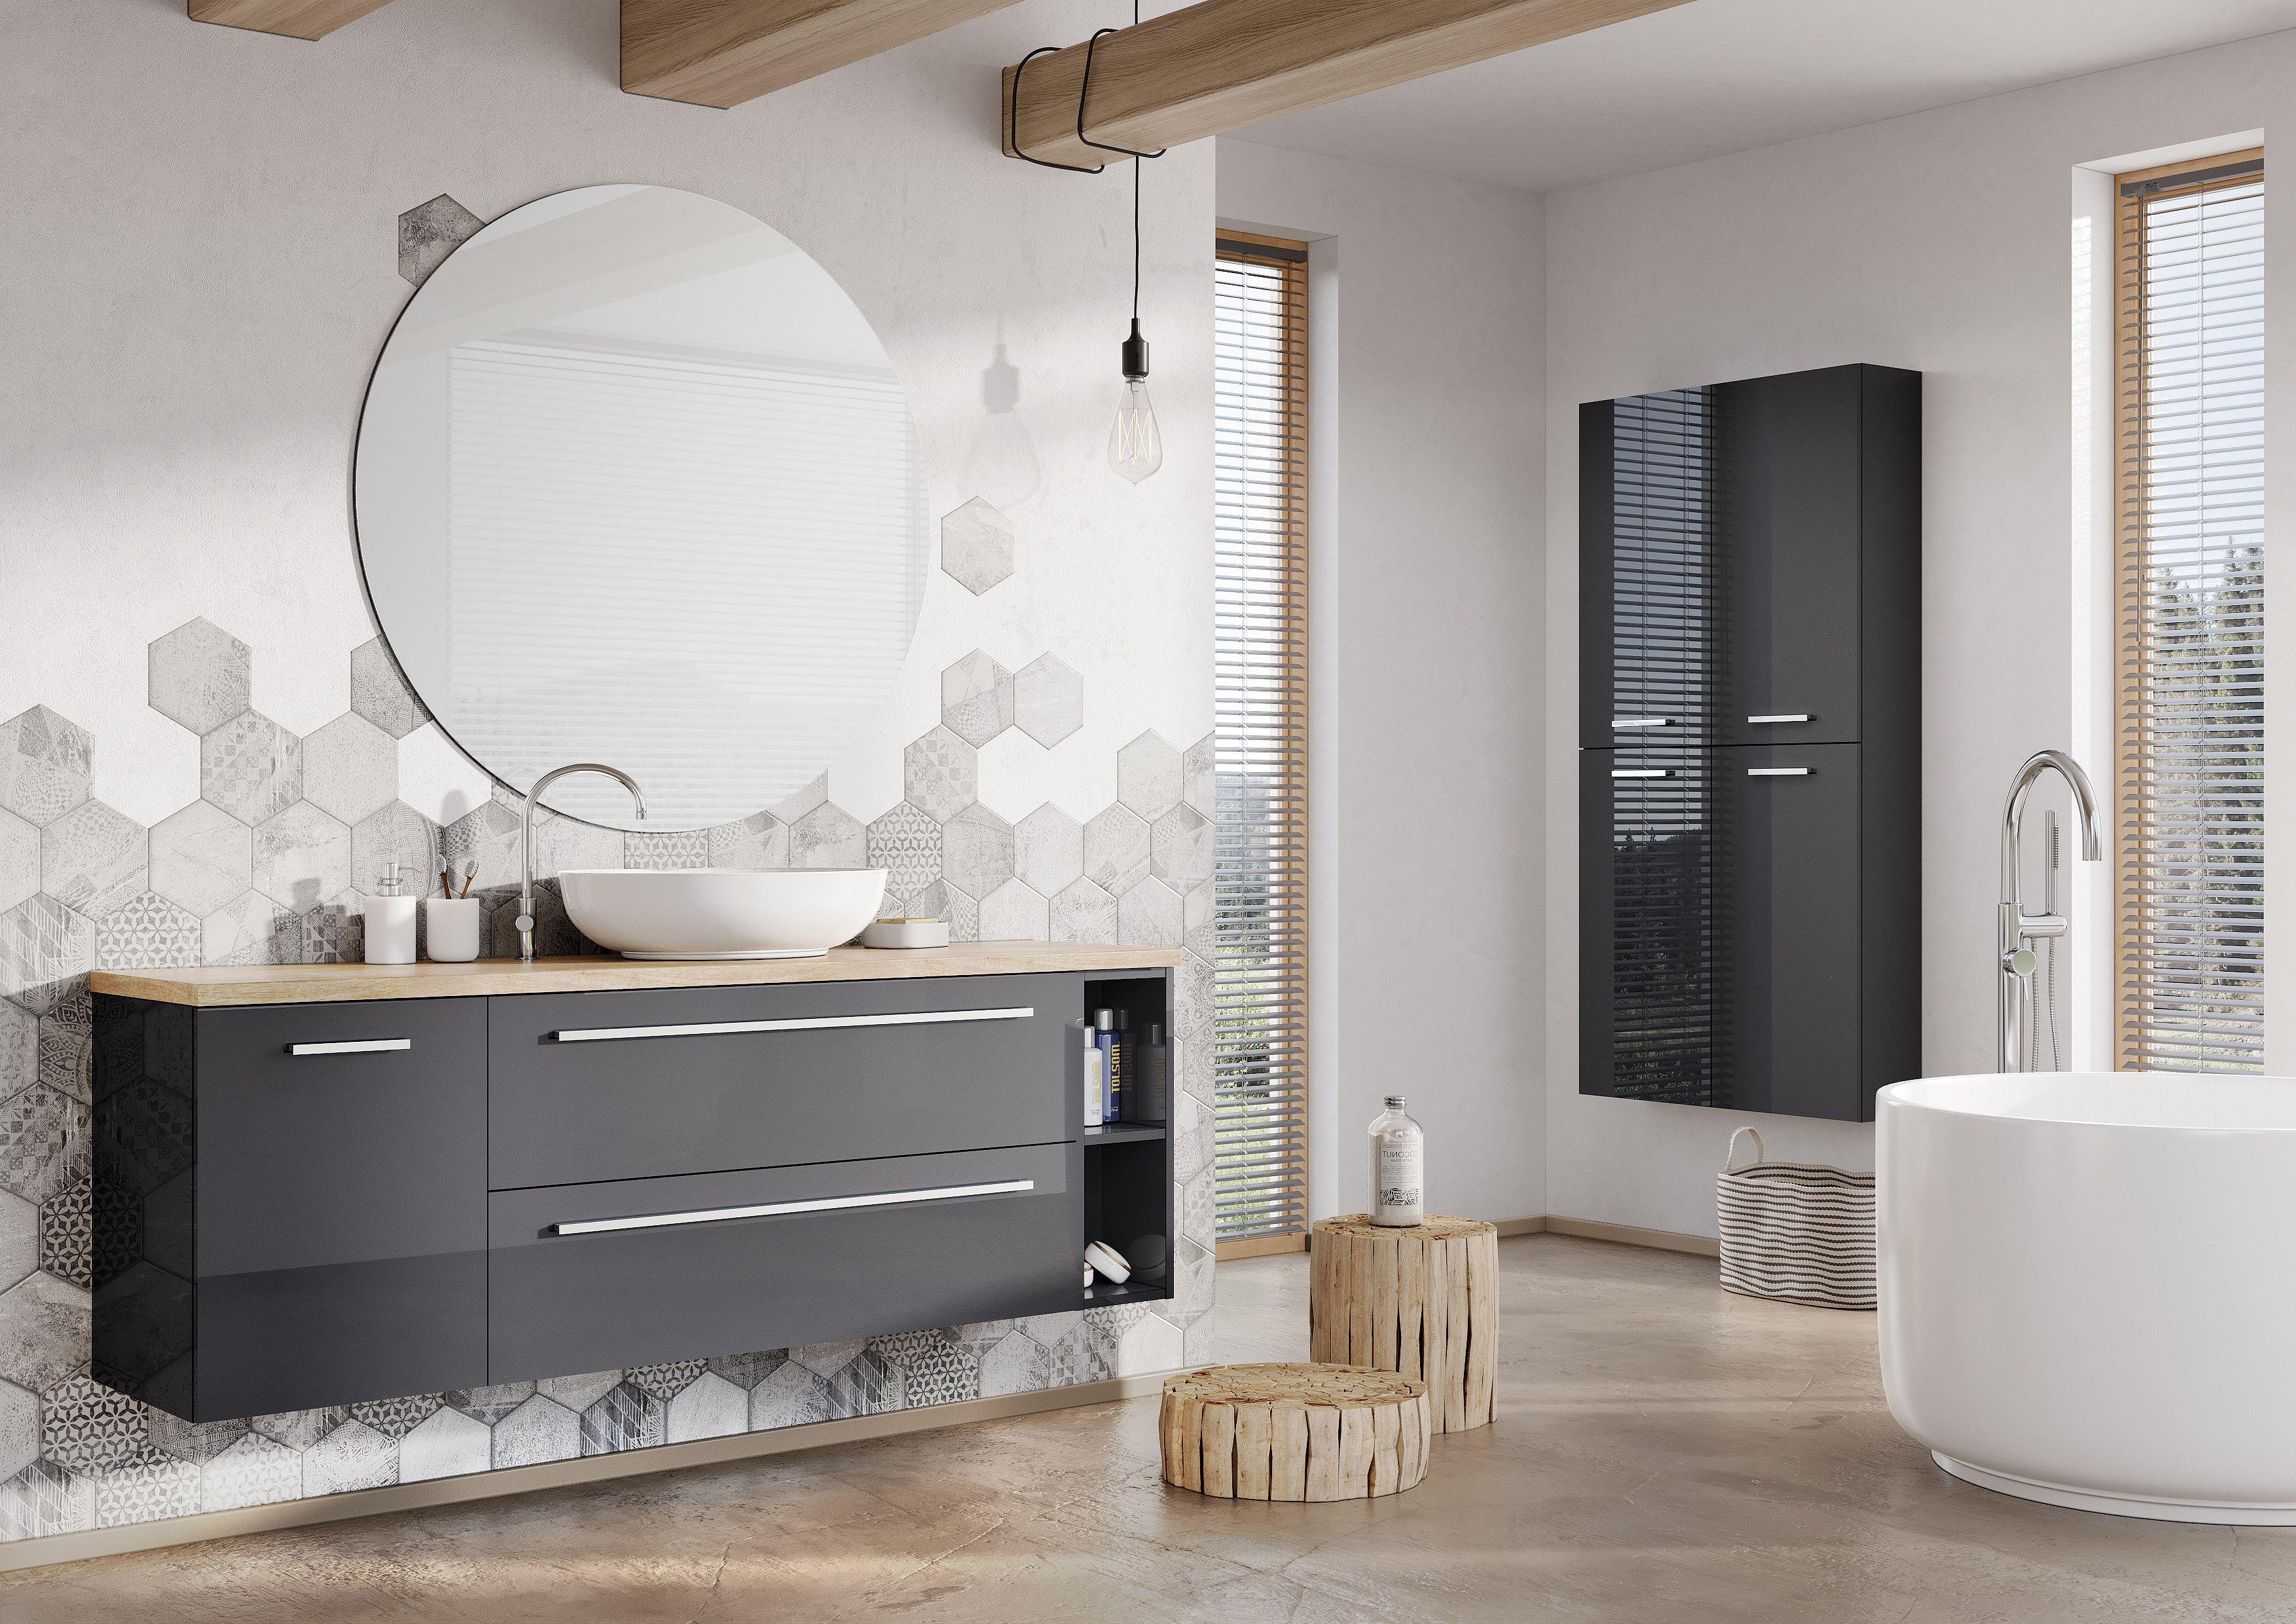 Meble łazienkowe bathroom furniture kwadro plus collection